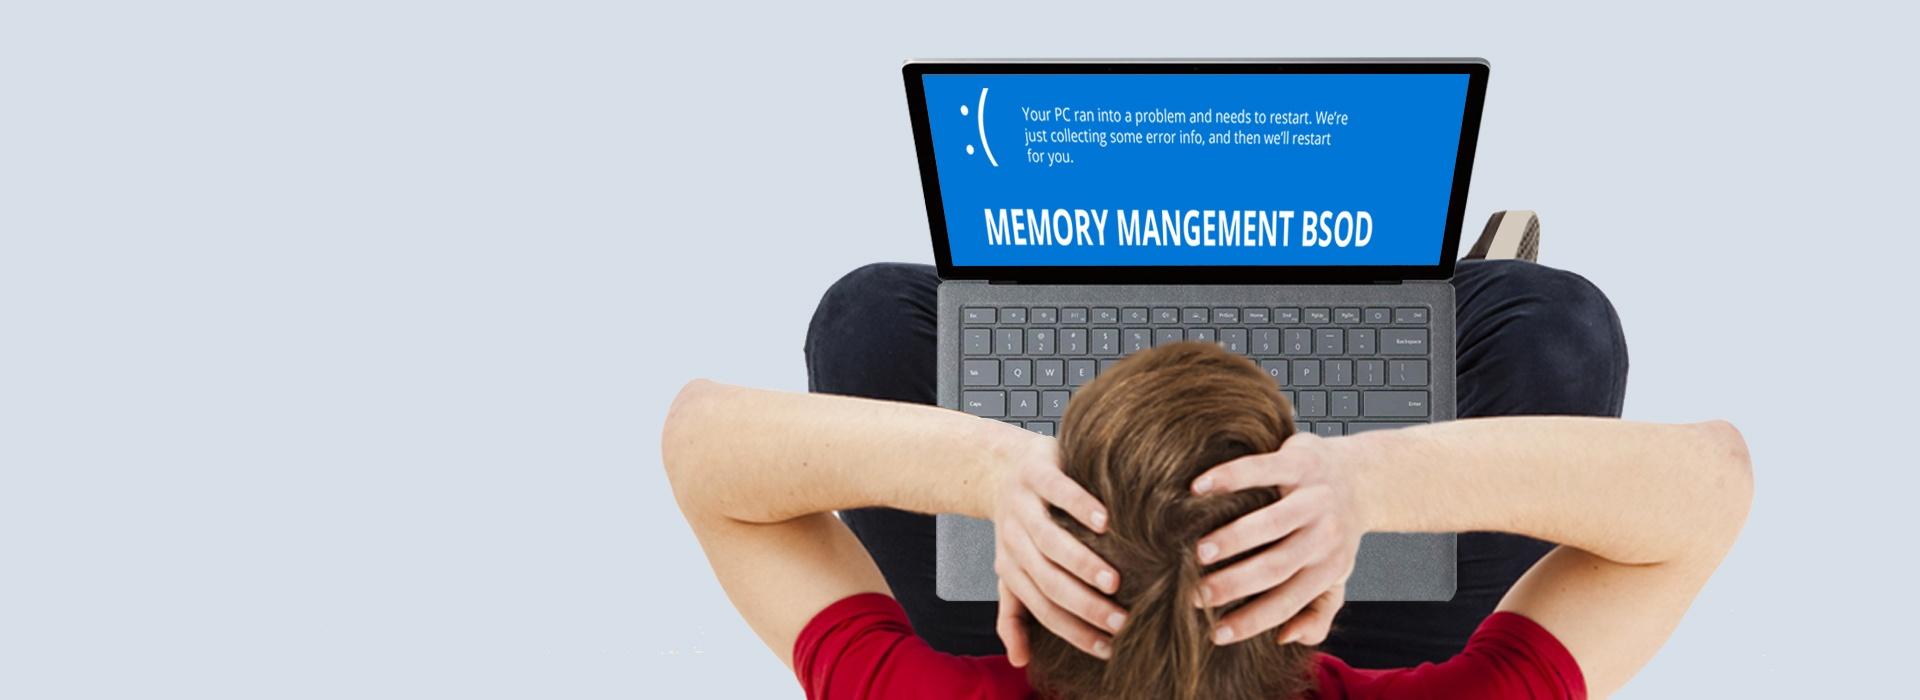 windows.com/stopcode memory management